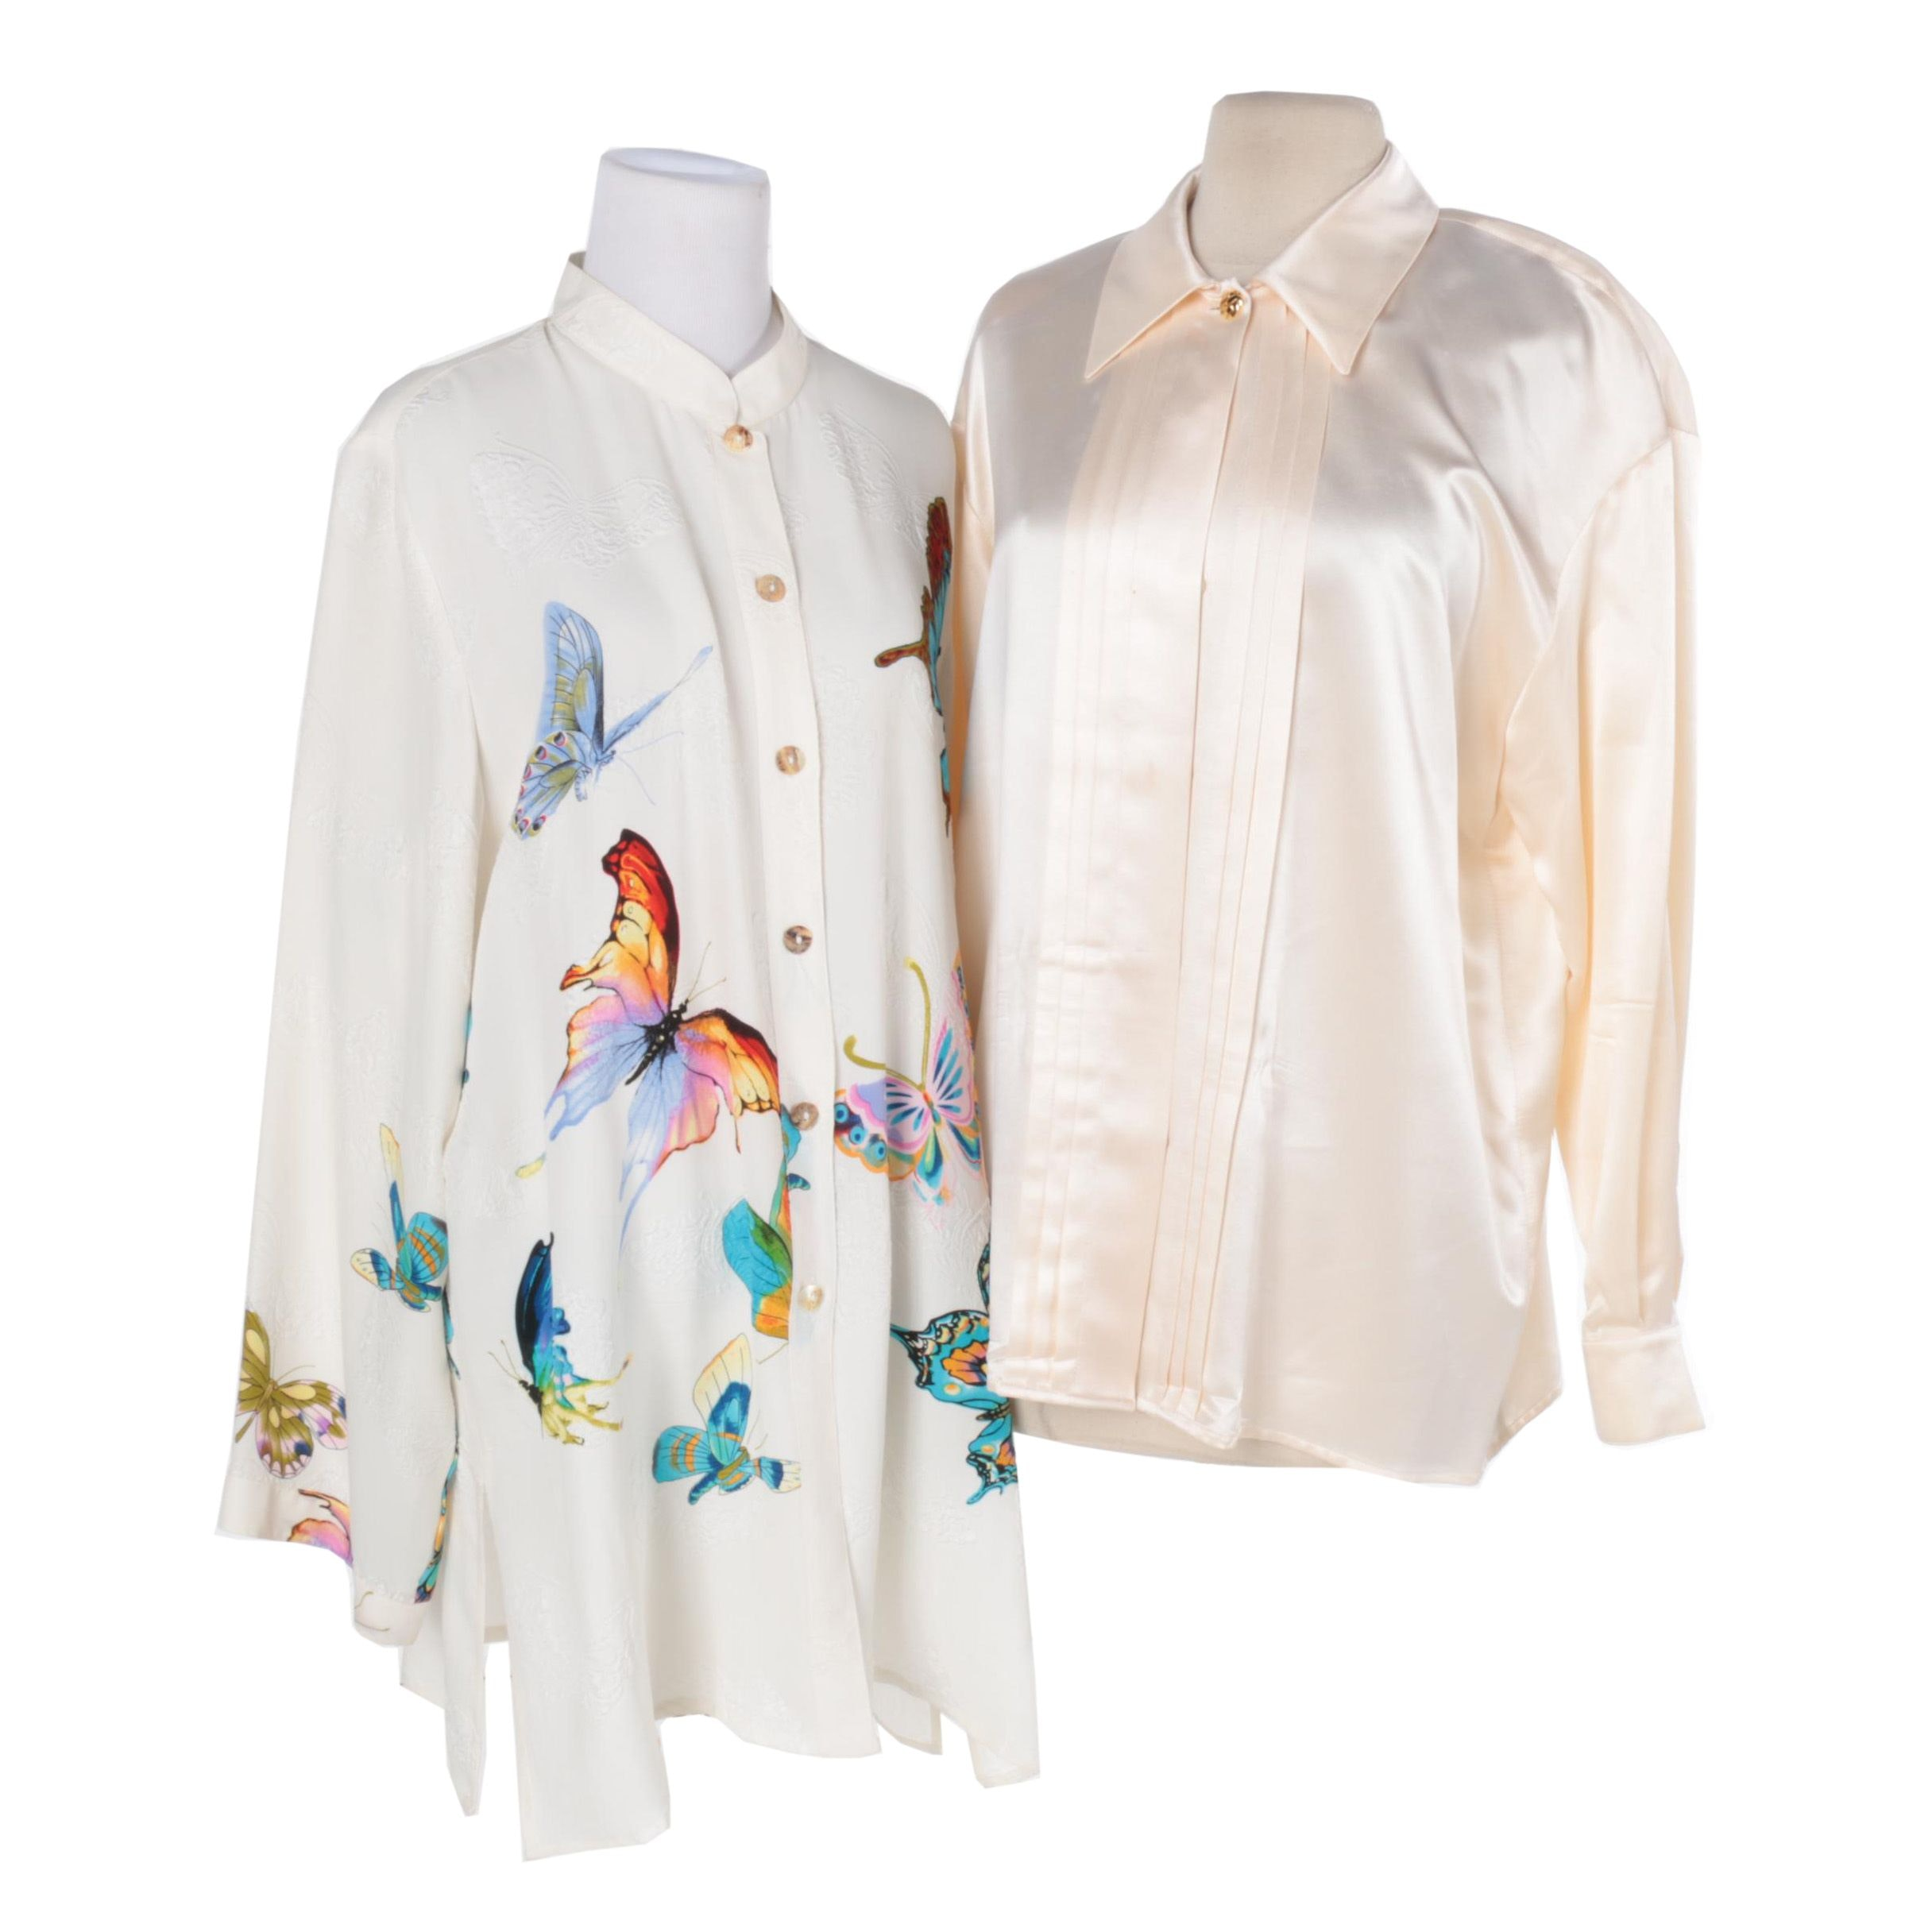 Women's Silk Shirts